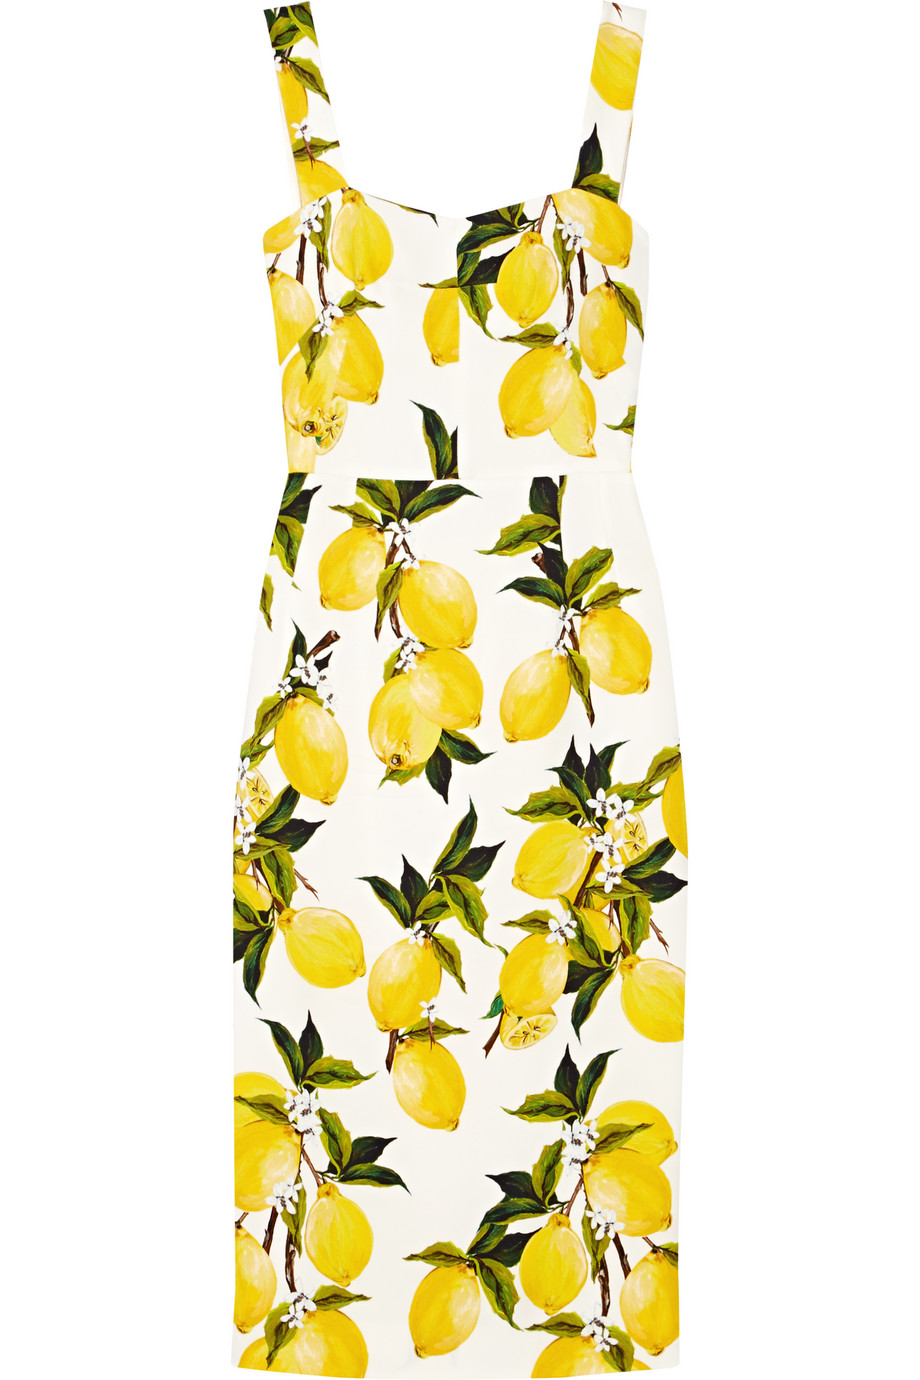 Dolce & Gabbana Printed Stretch-Cady Midi Dress, Yellow, Women's - Printed, Size: 42